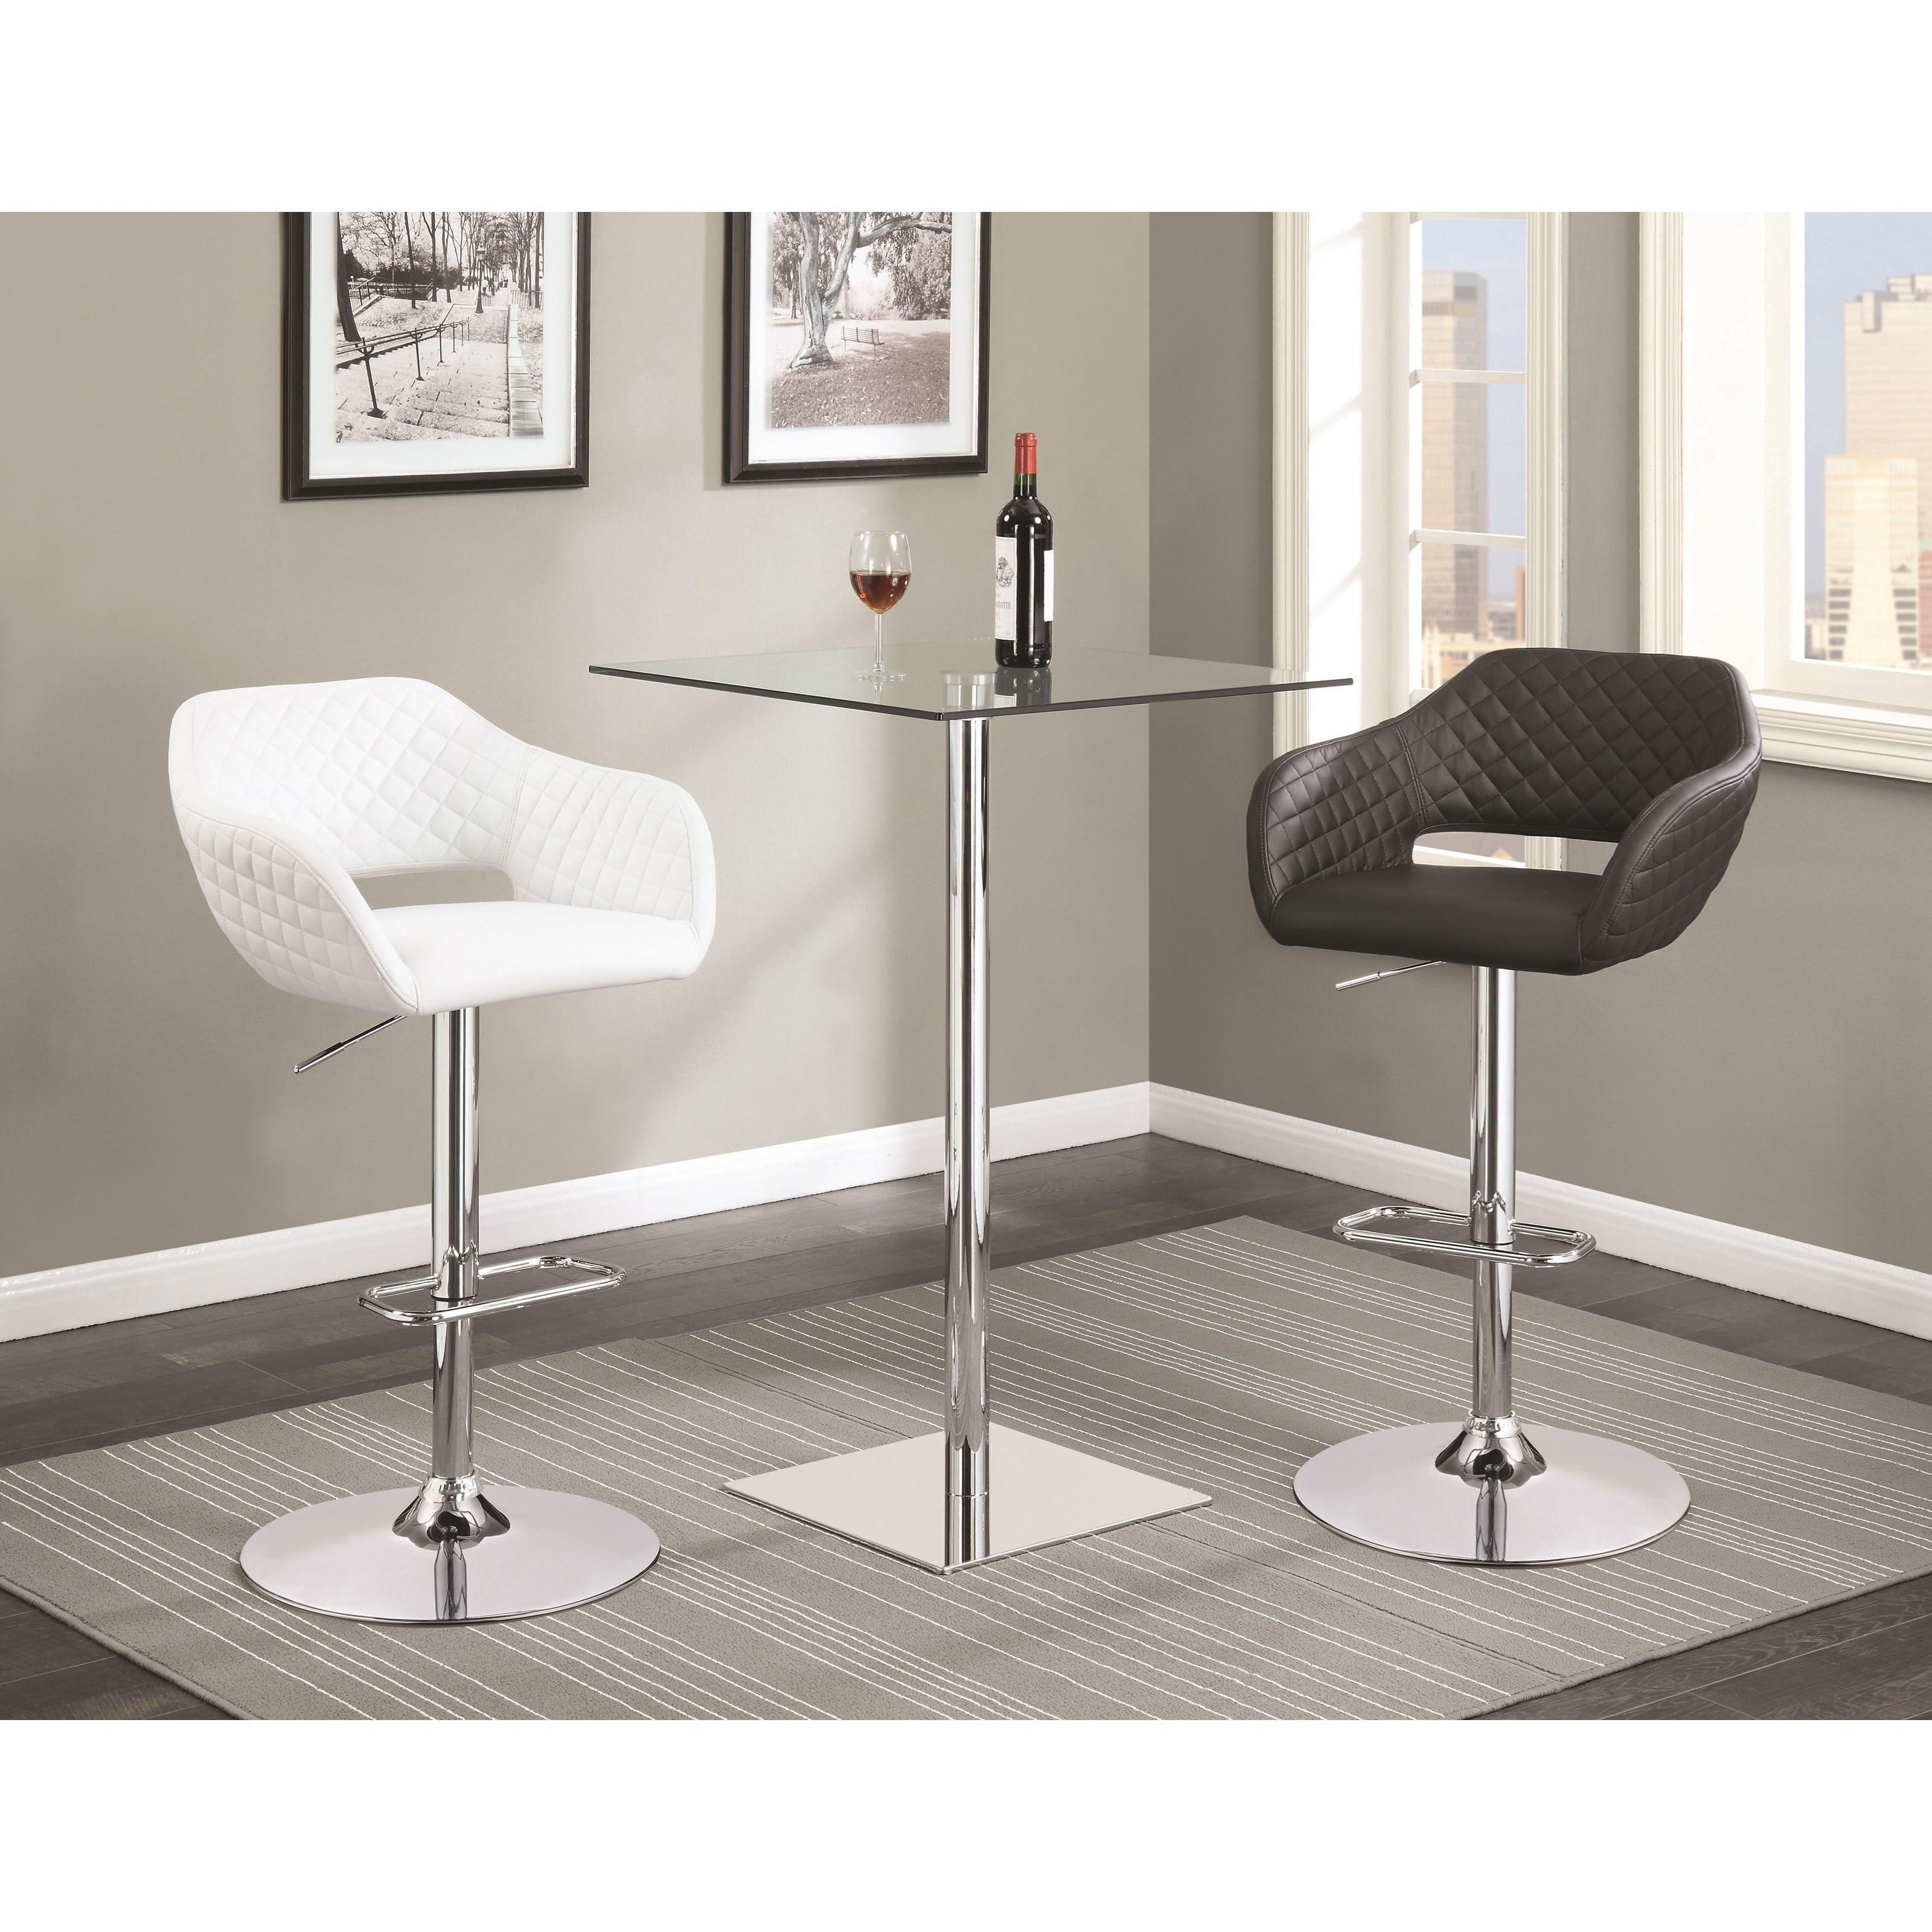 Coaster Bar Units and Bar Tables Bar Table - Item Number: 102951